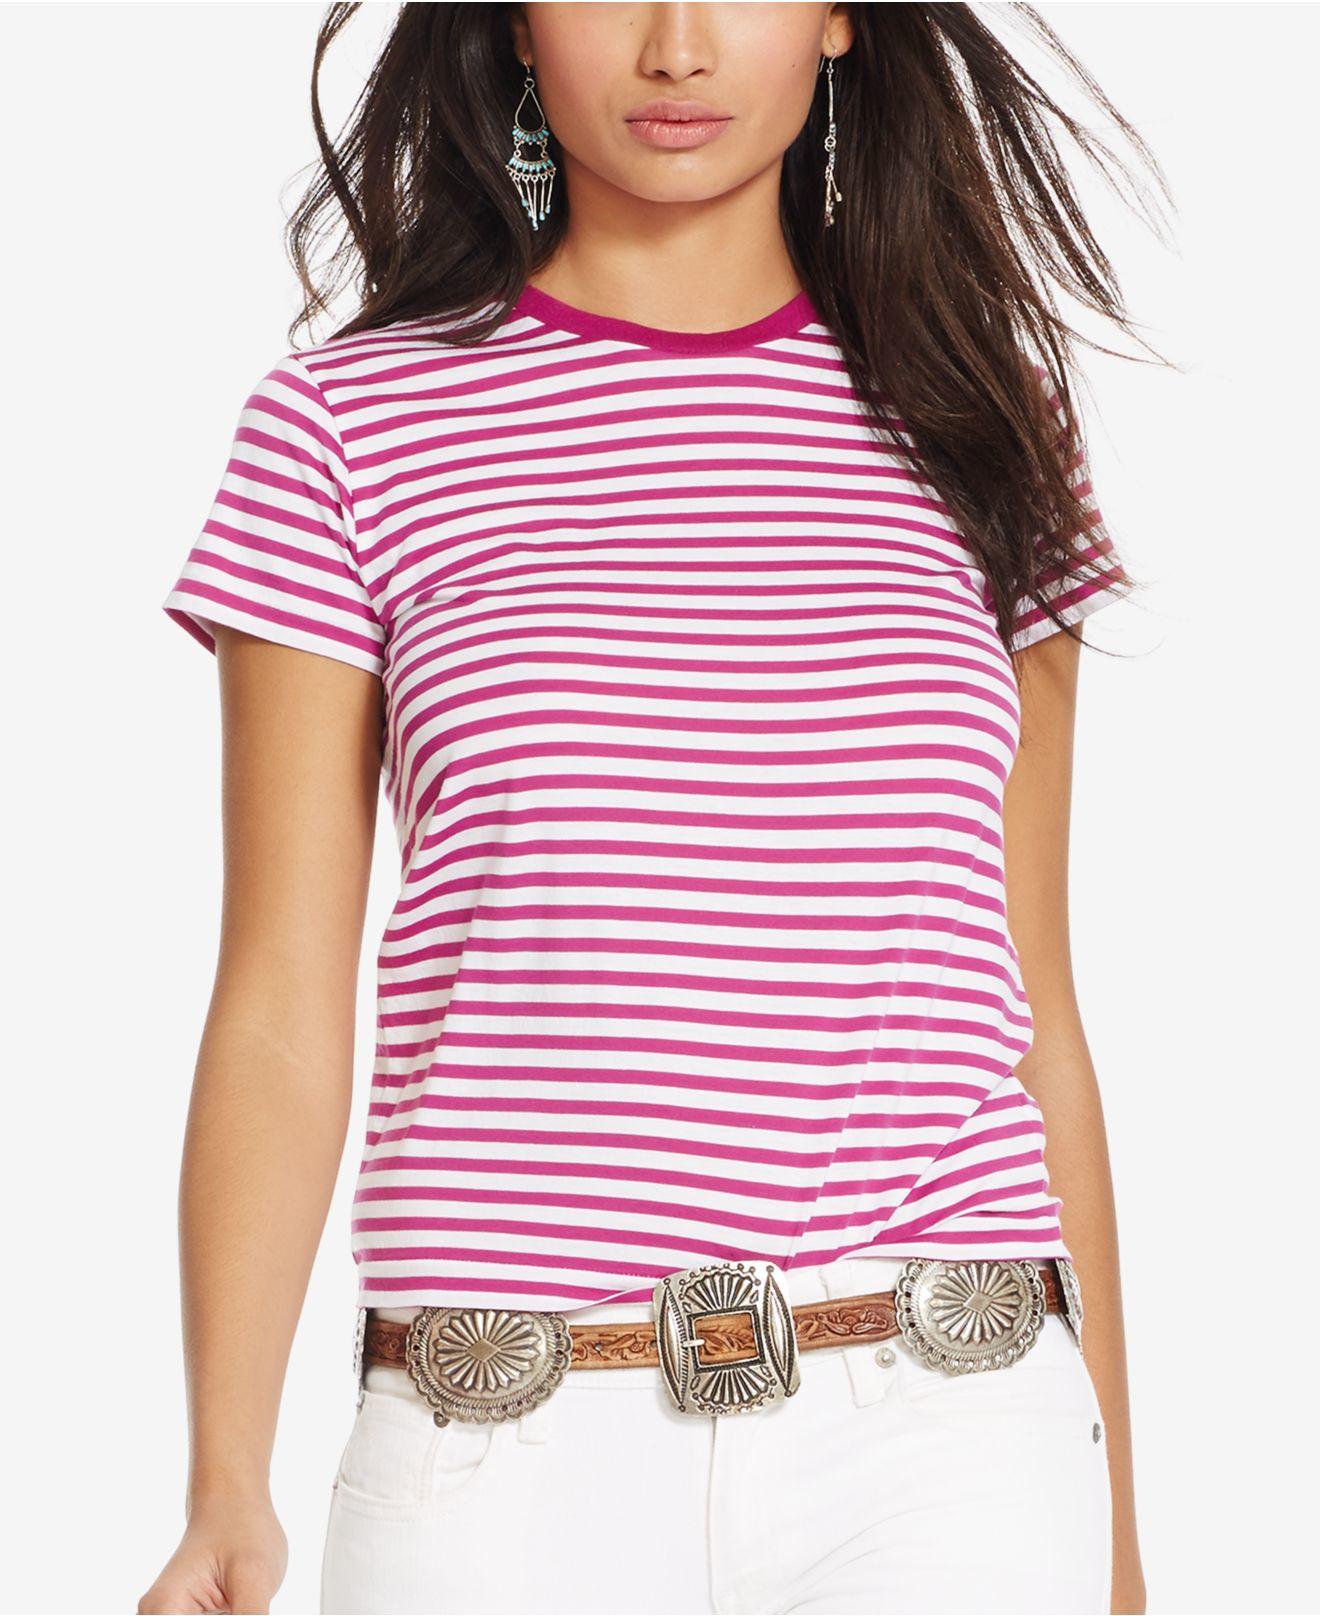 Crew Lauren Striped Ralph Neck Pink Polo T Shirt shtrxQCd